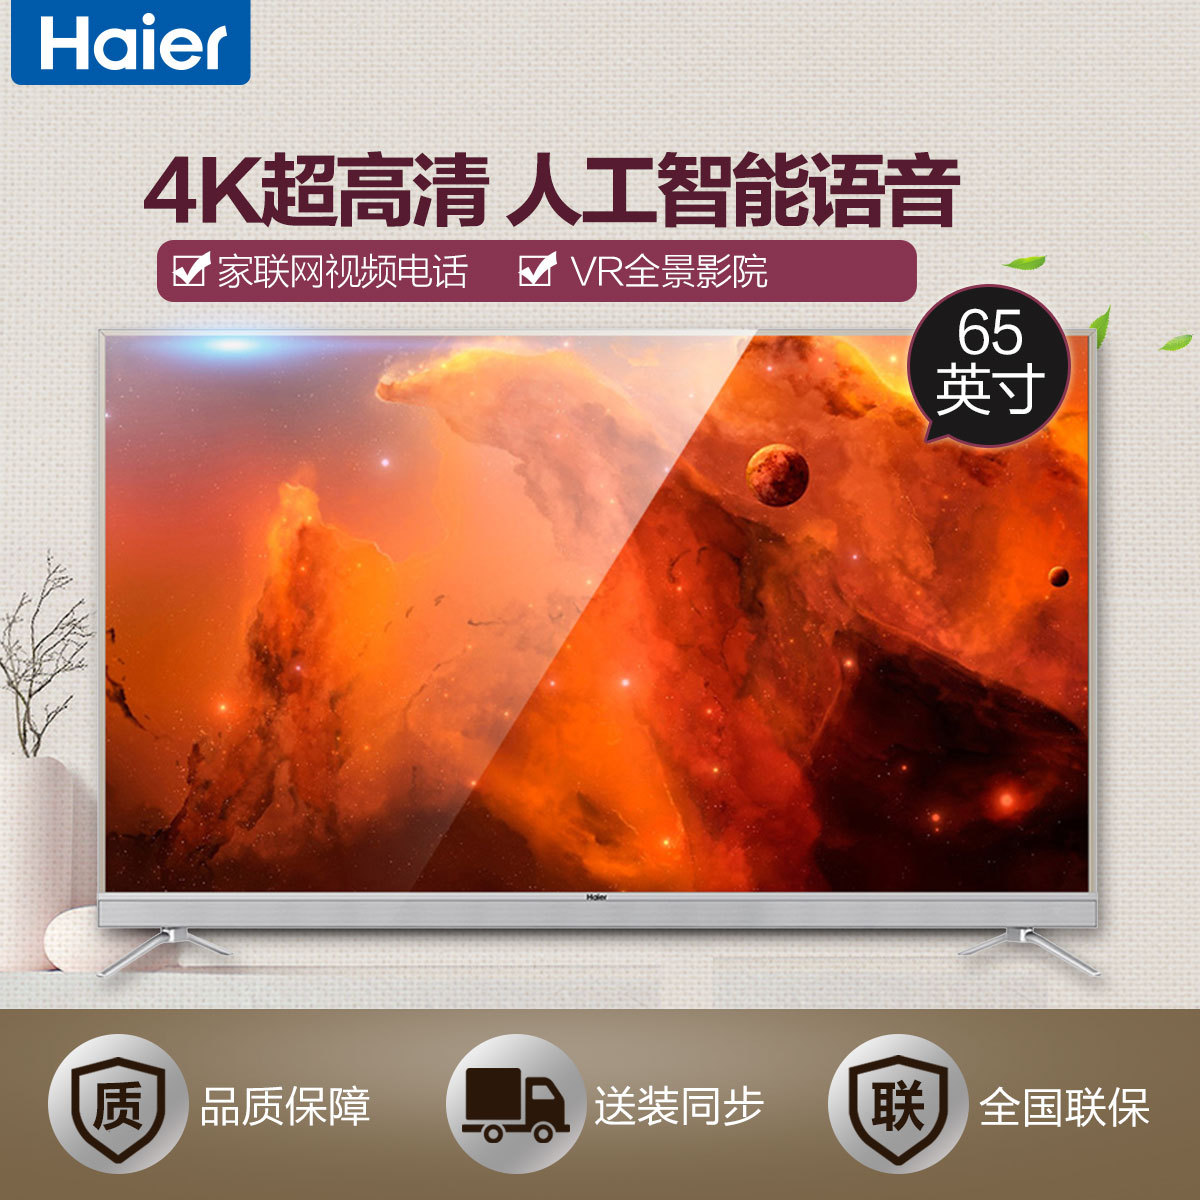 Haier/海尔4K电视LS65AL88T72